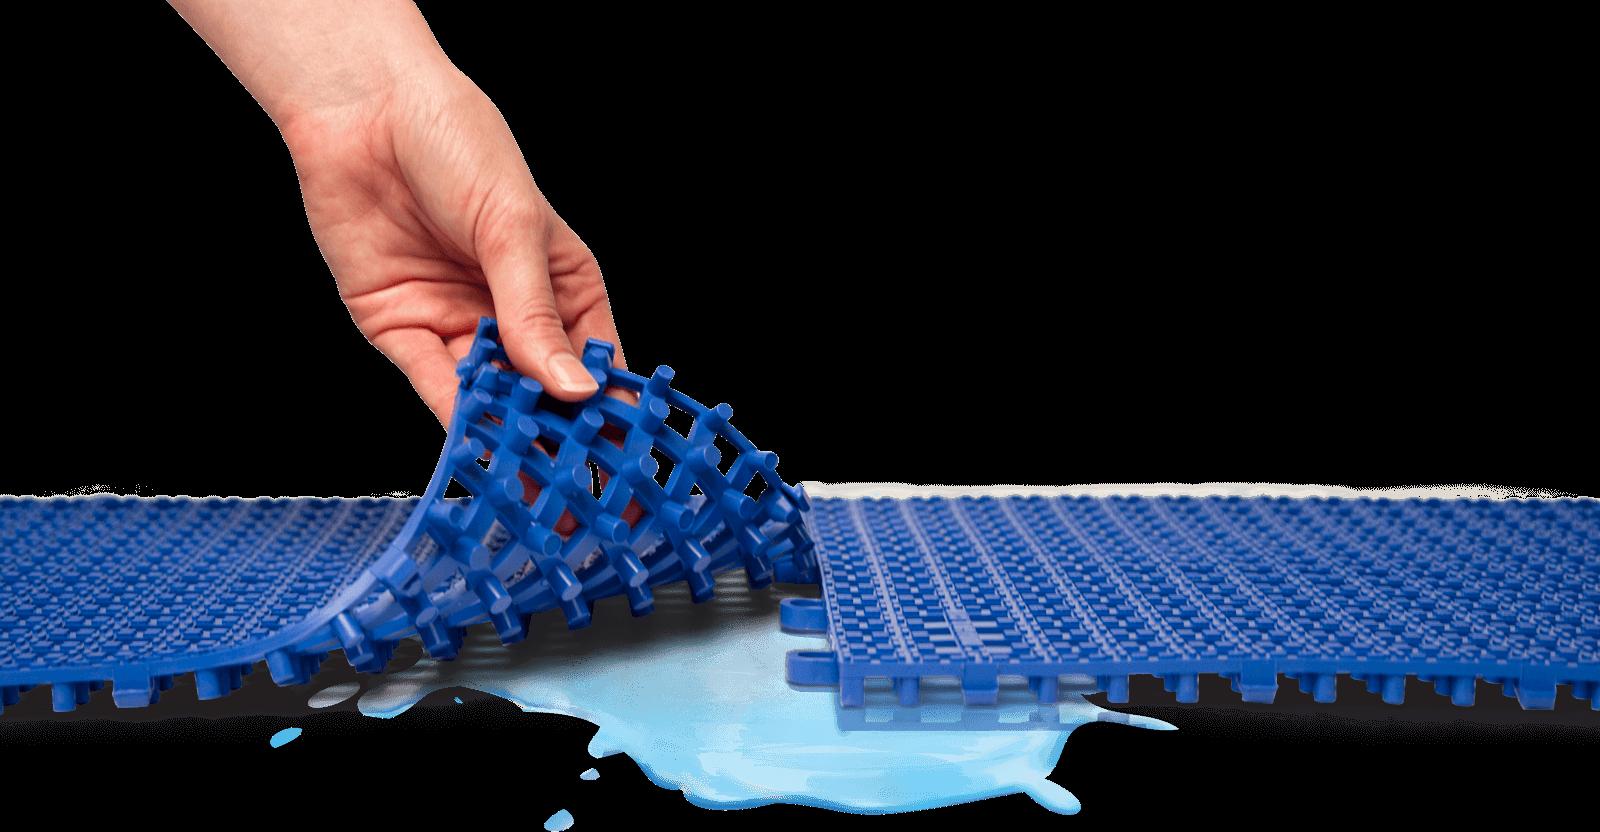 Flexible safety matting - contact